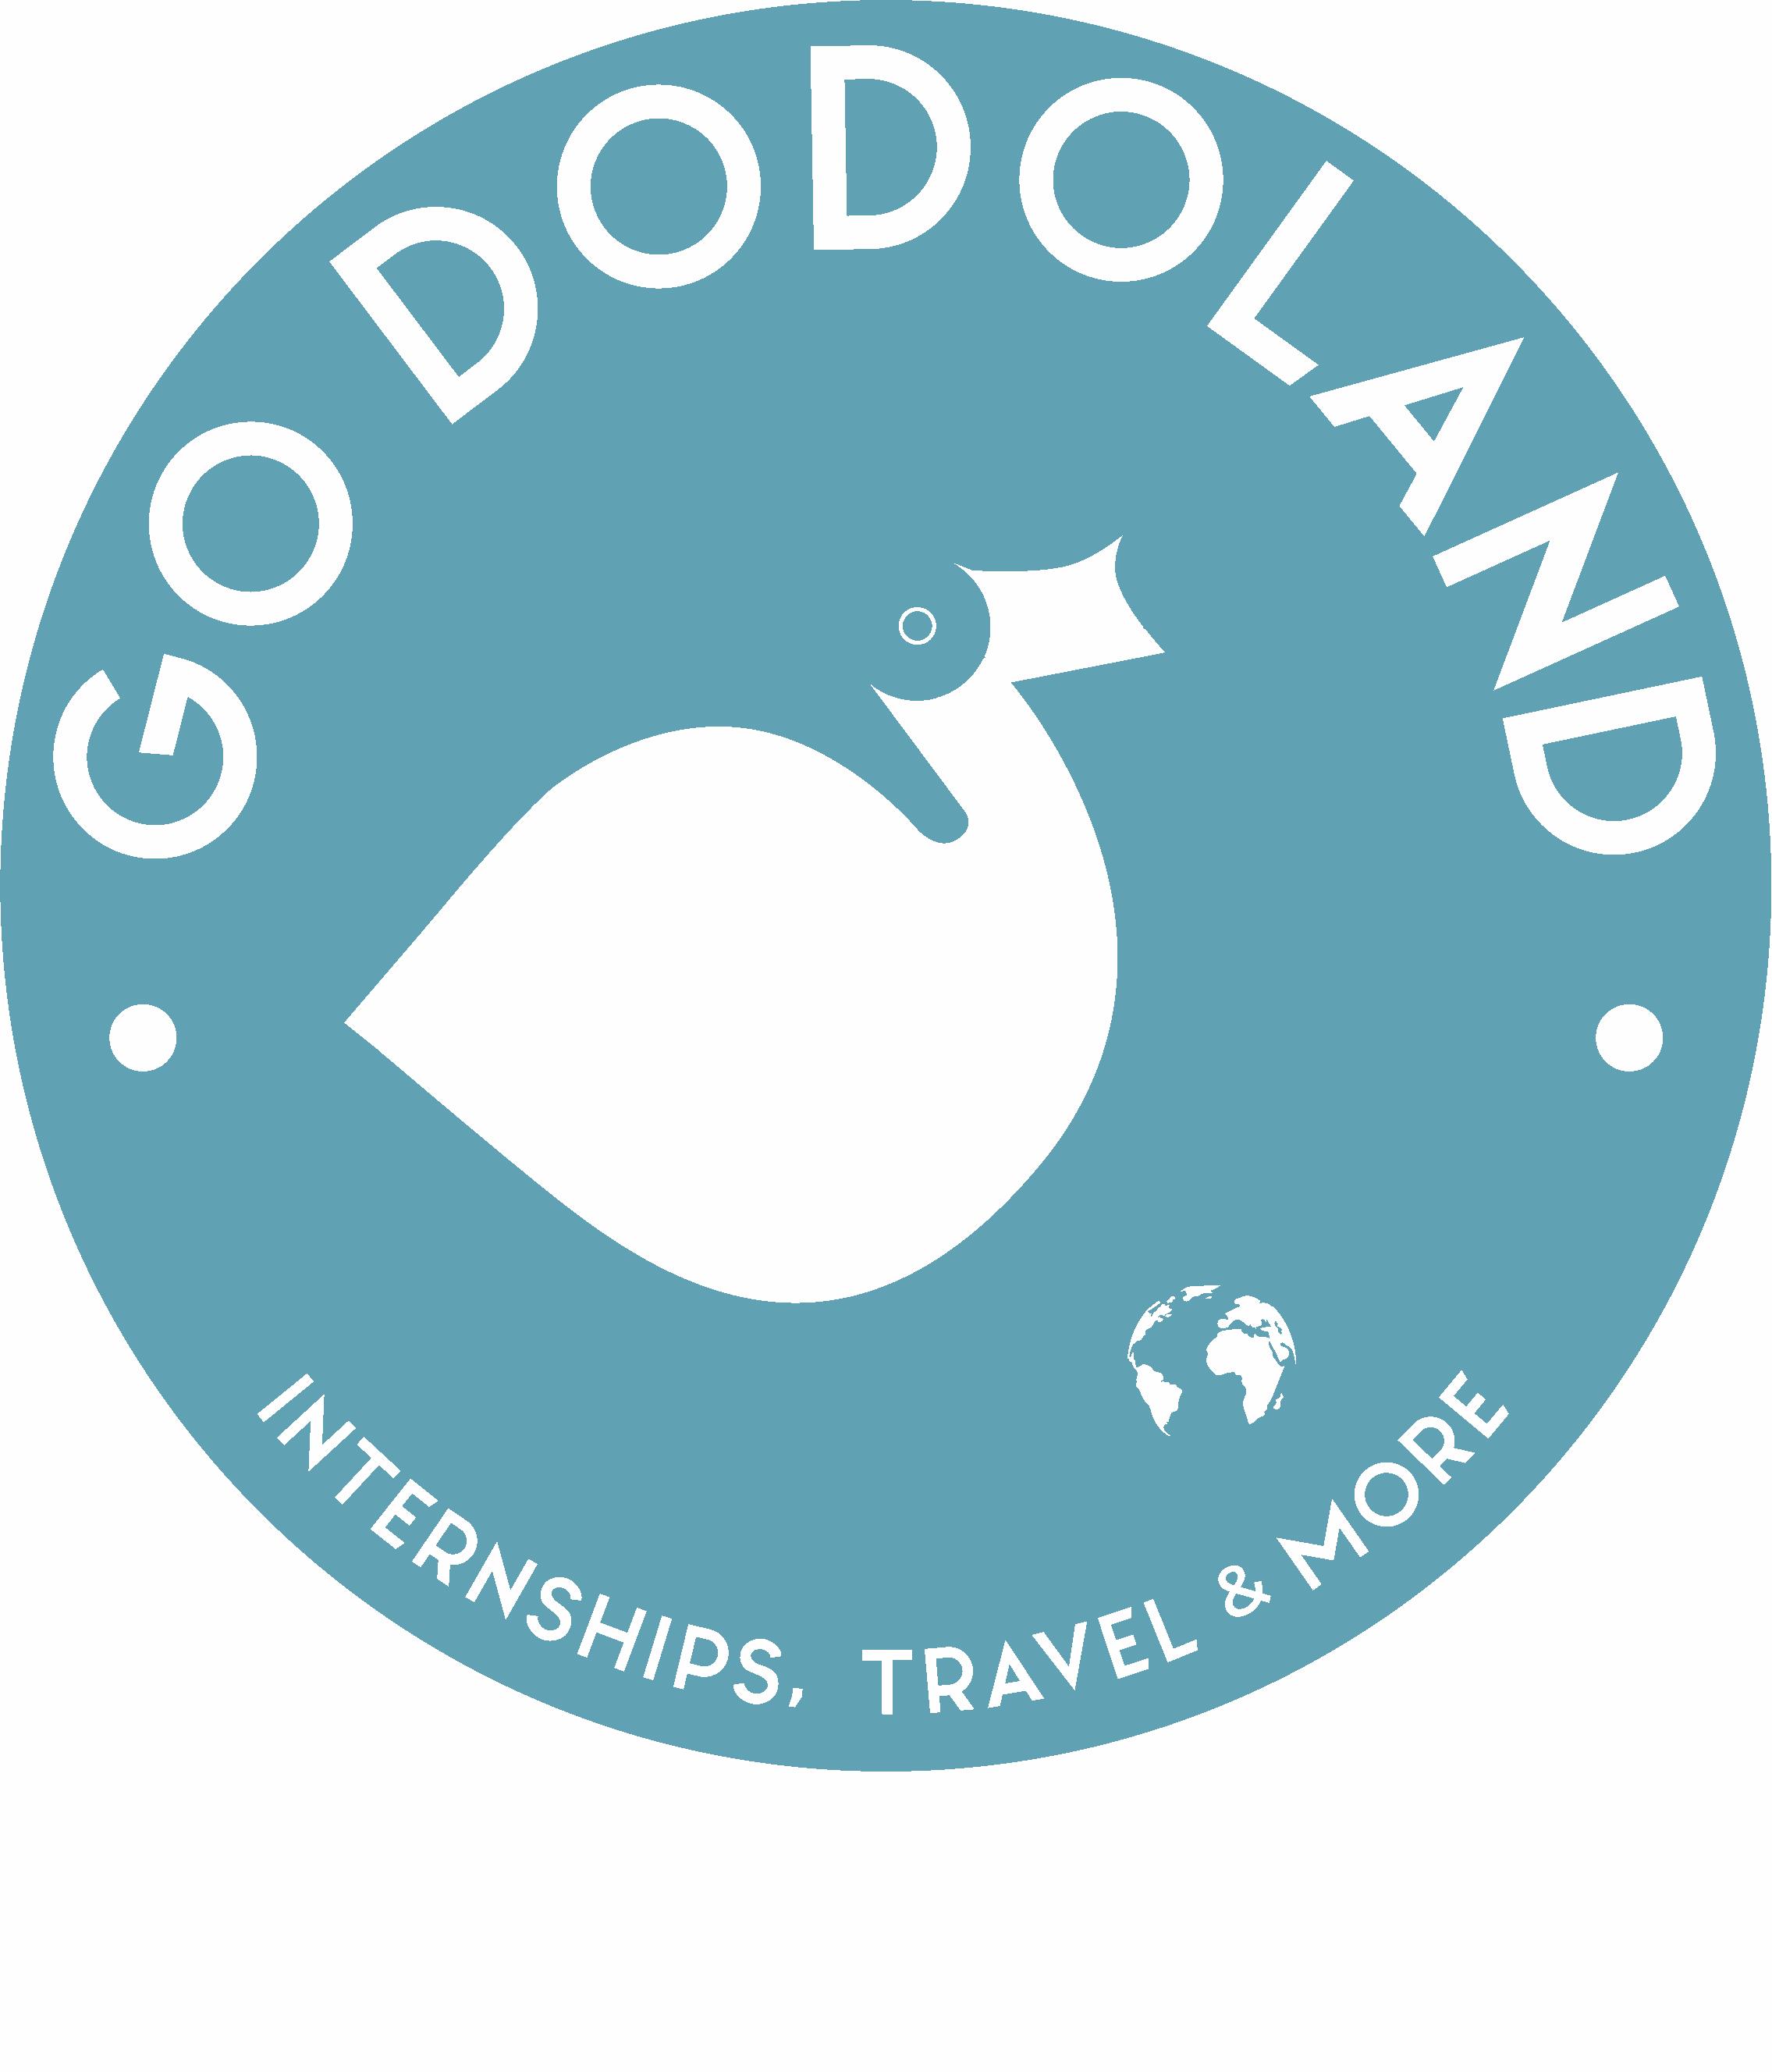 Go Dodoland